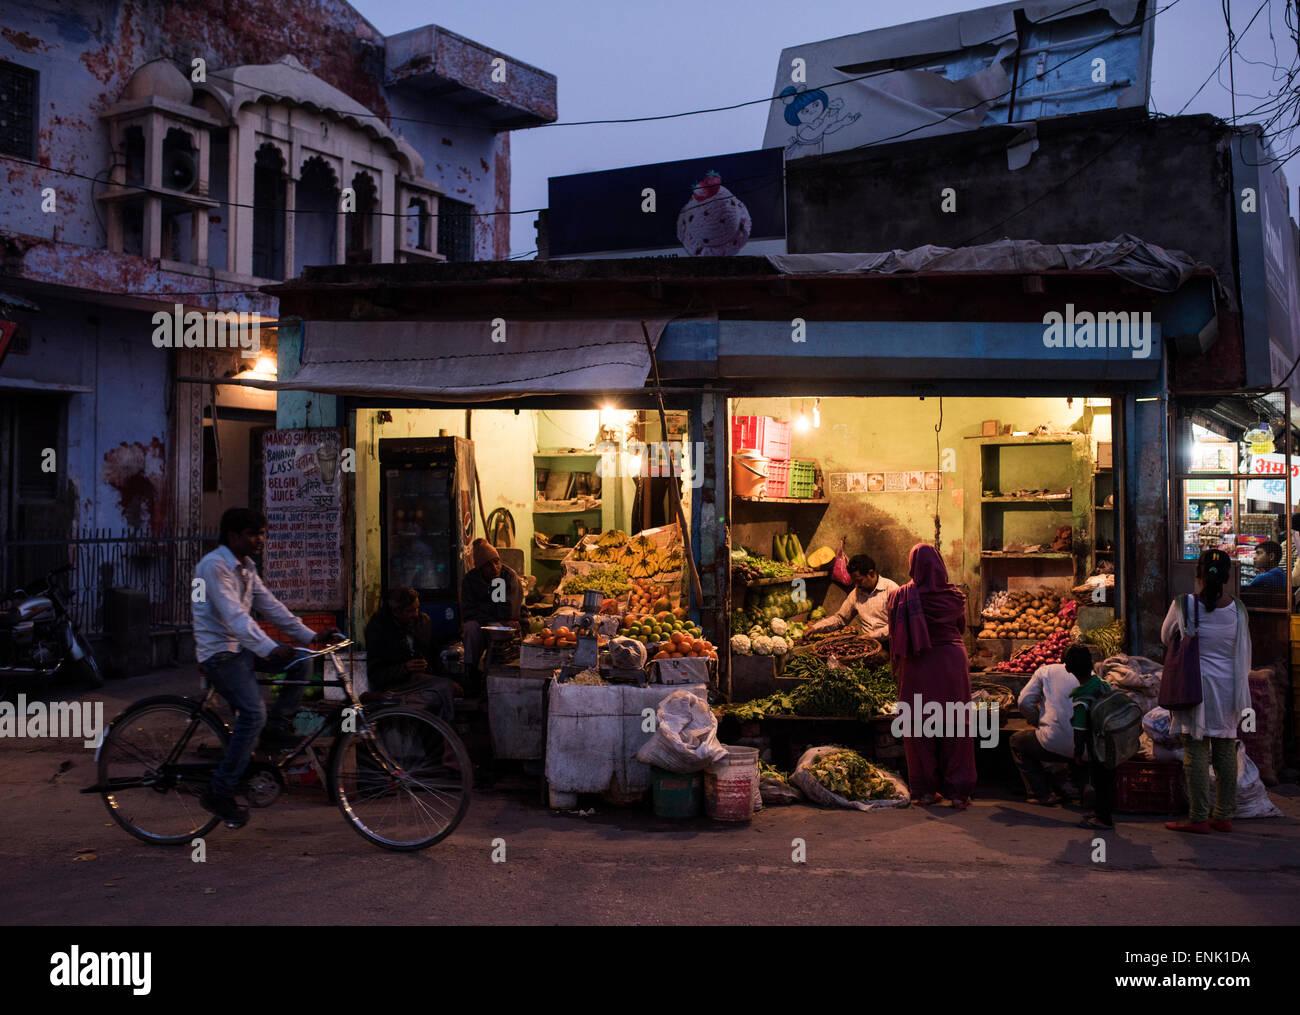 Street greengrocers at night, Agra, Uttar Pradesh, India, Asia - Stock Image